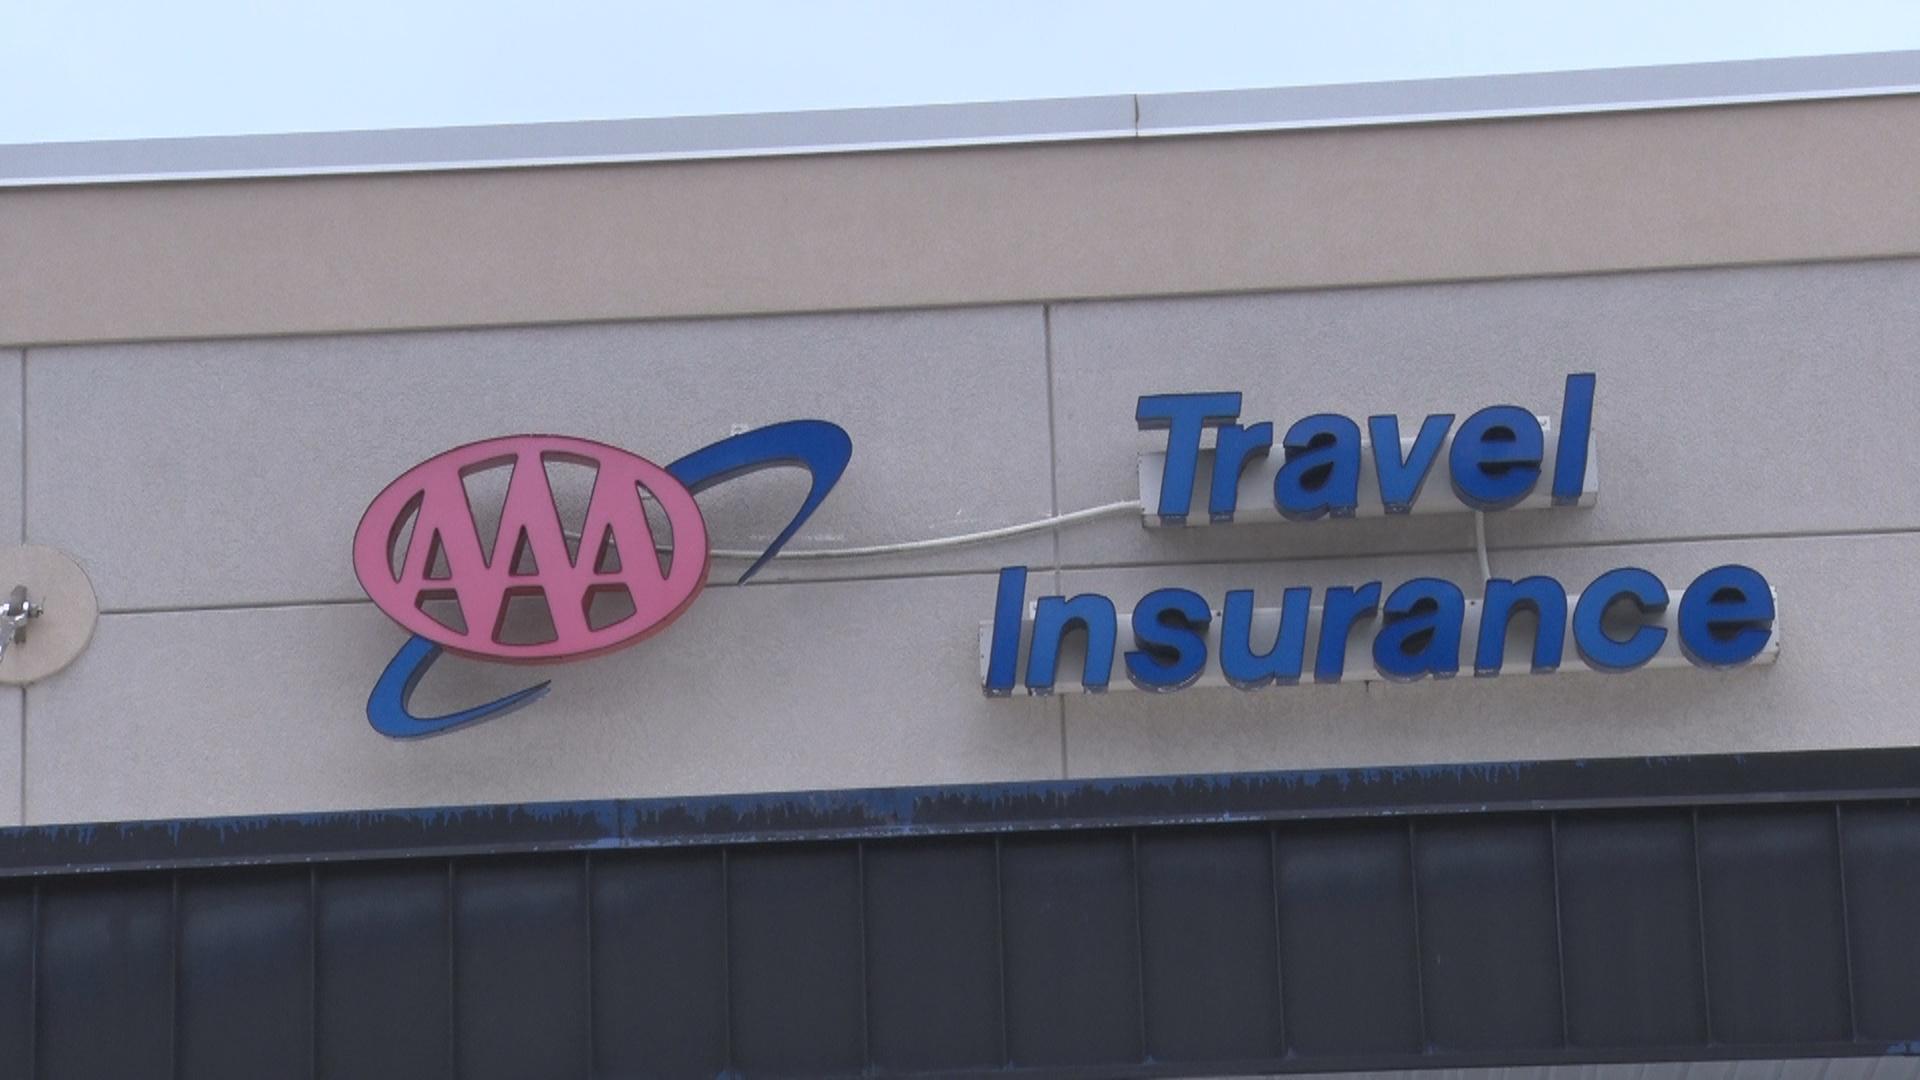 AAA Travel Insurance.jpg